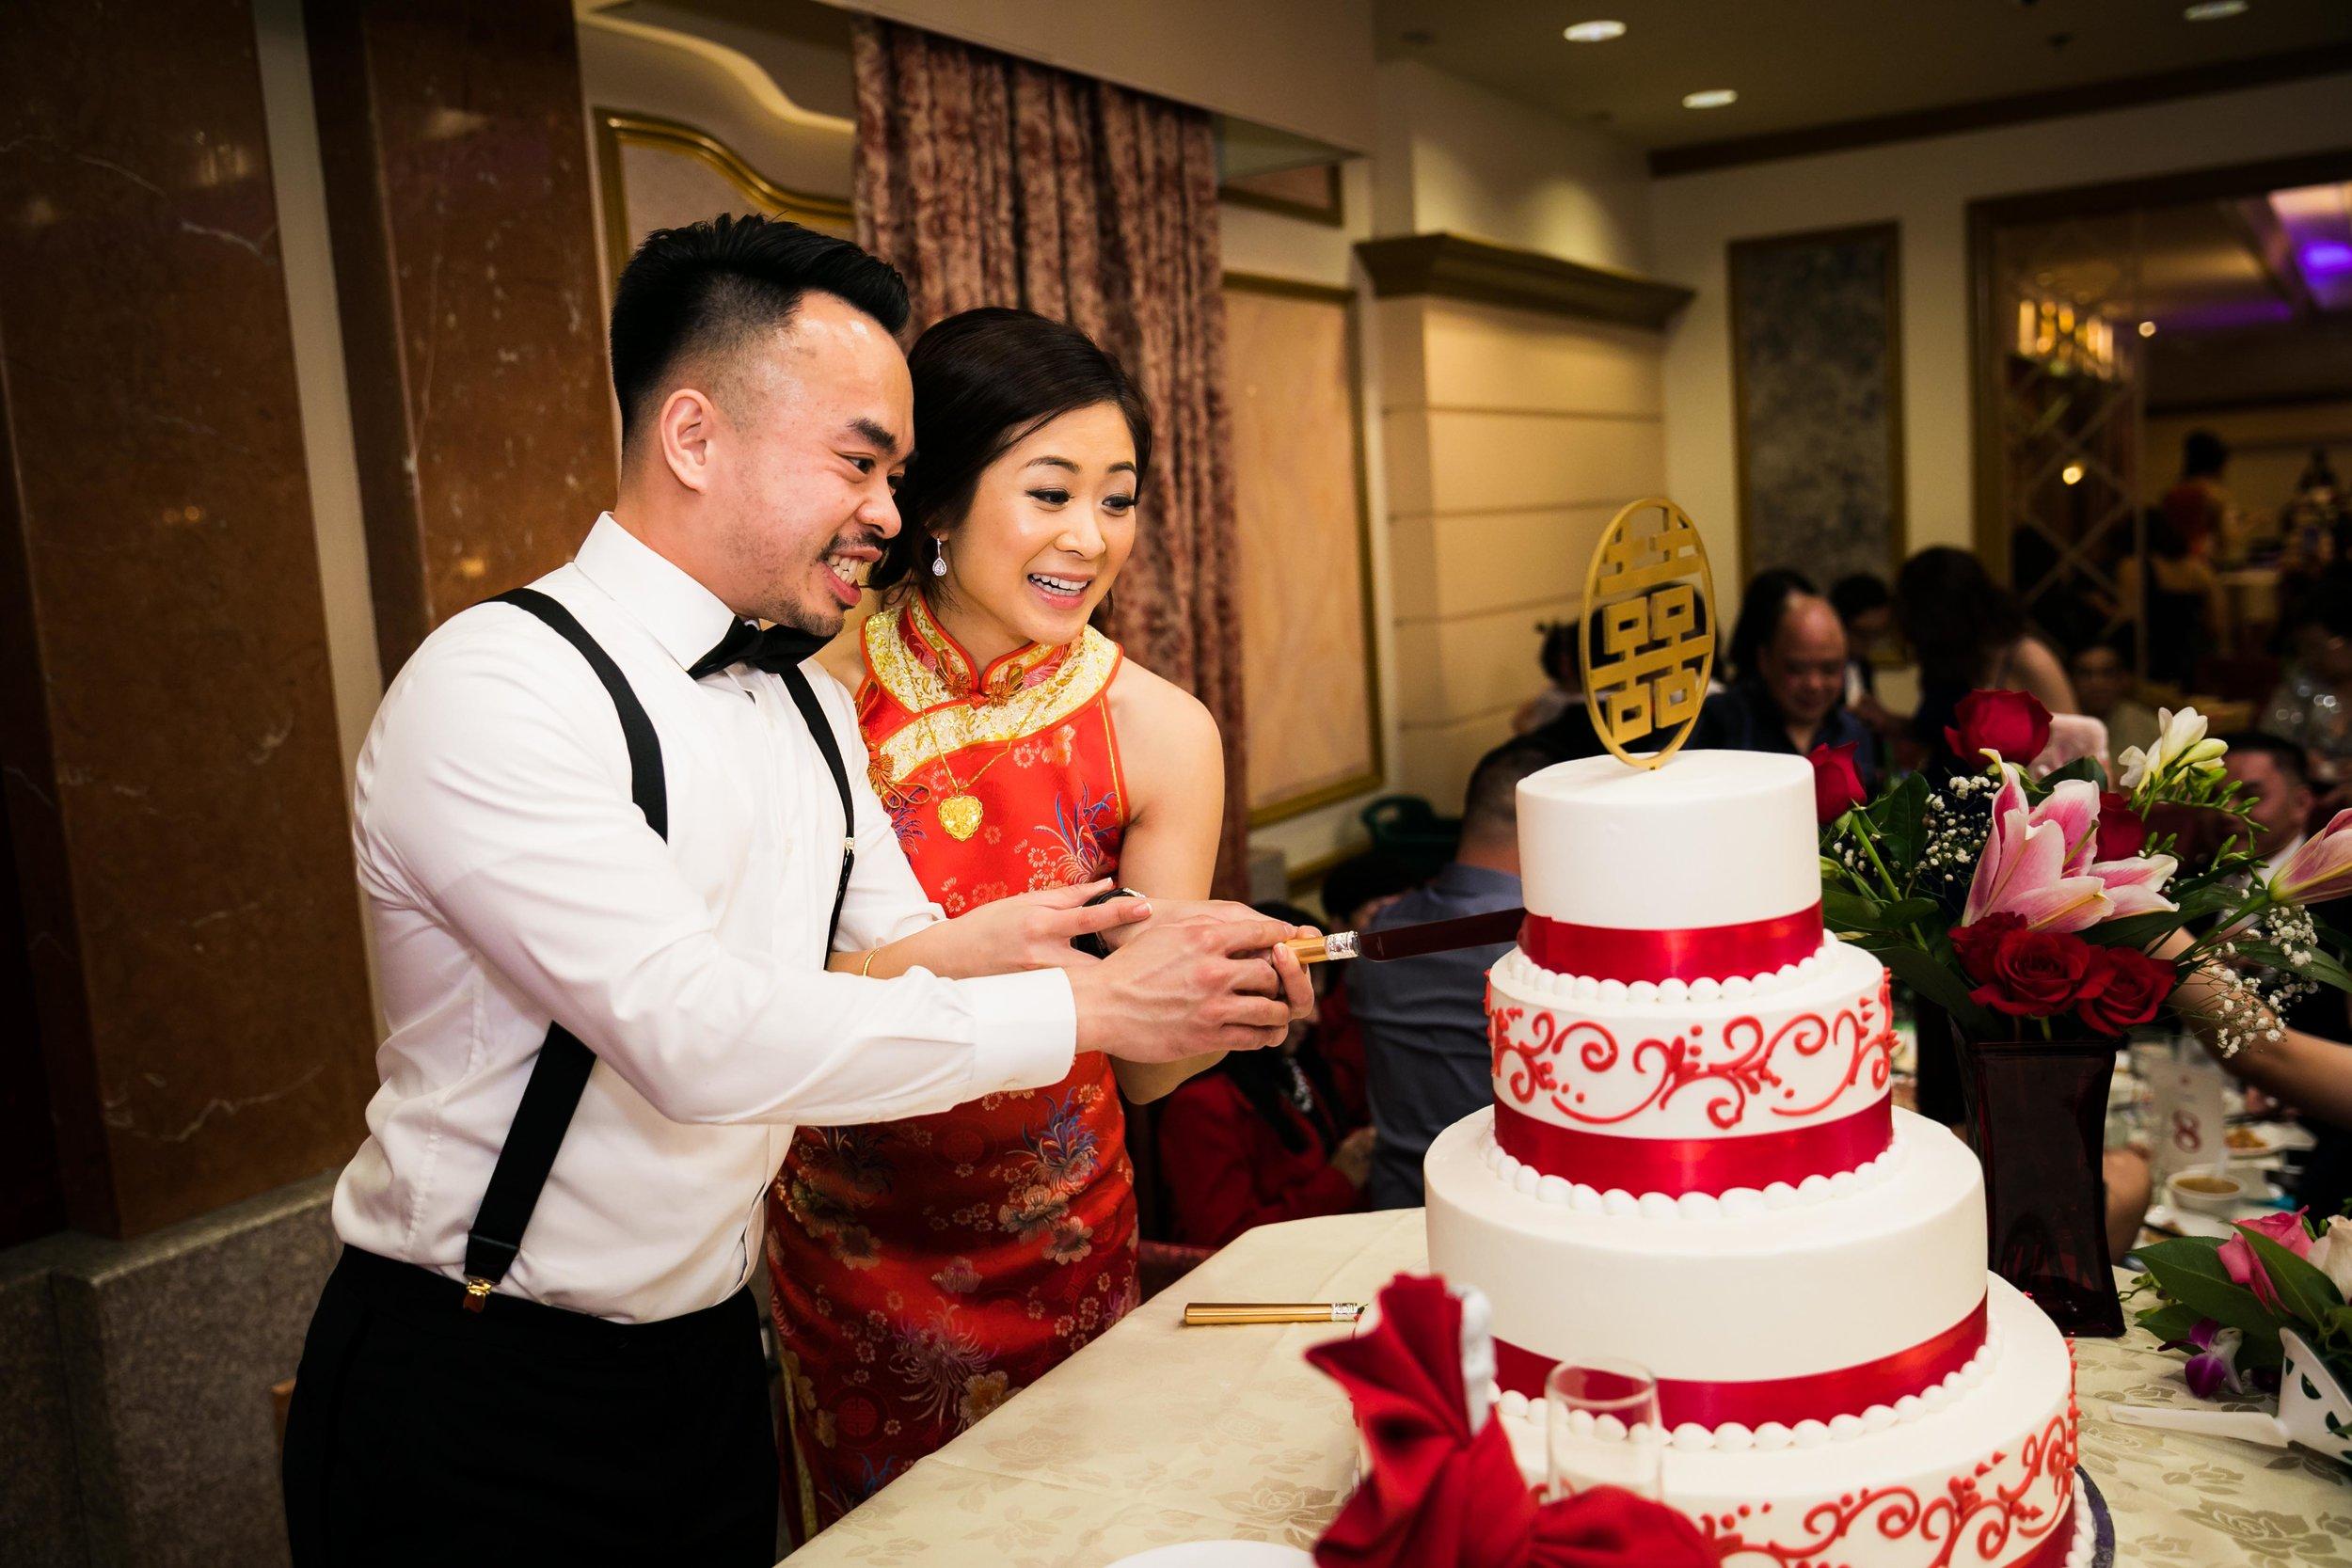 chinese_ reception_southern_california_wedding_joshuachun_photography-3.JPG